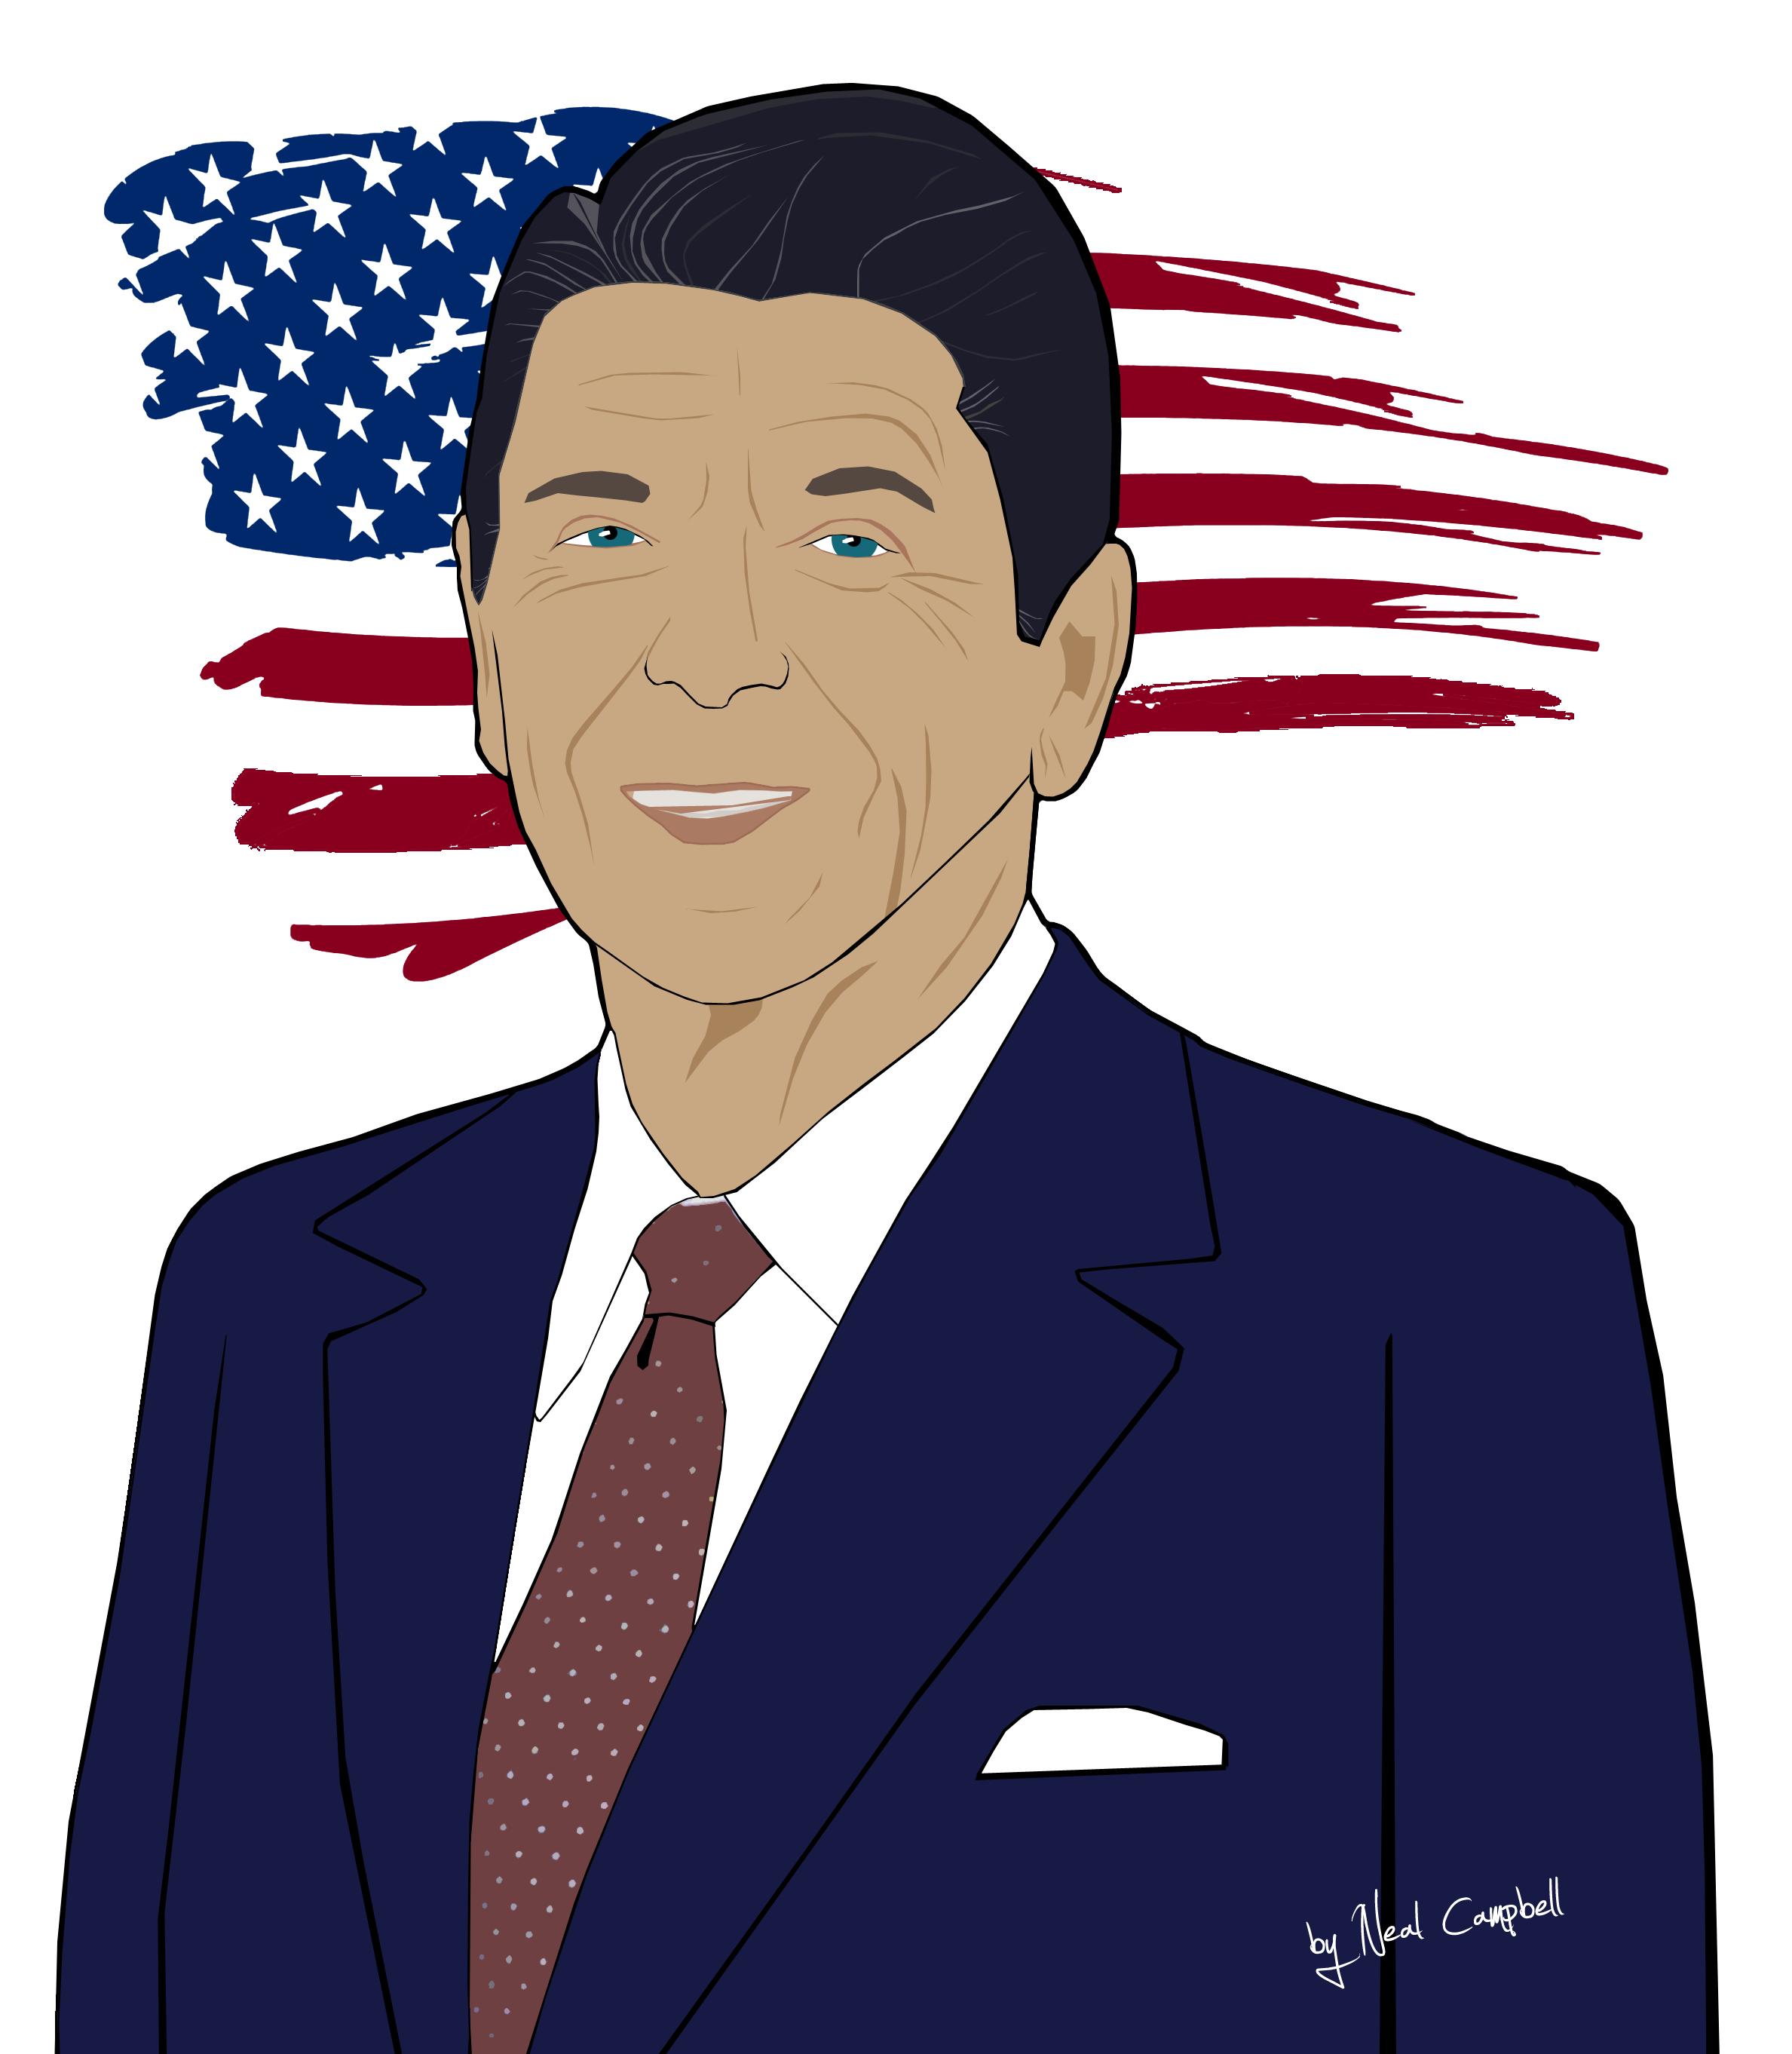 Ronald Reagan By Neal Campbell Ronald Reagan Portrait Cartoon